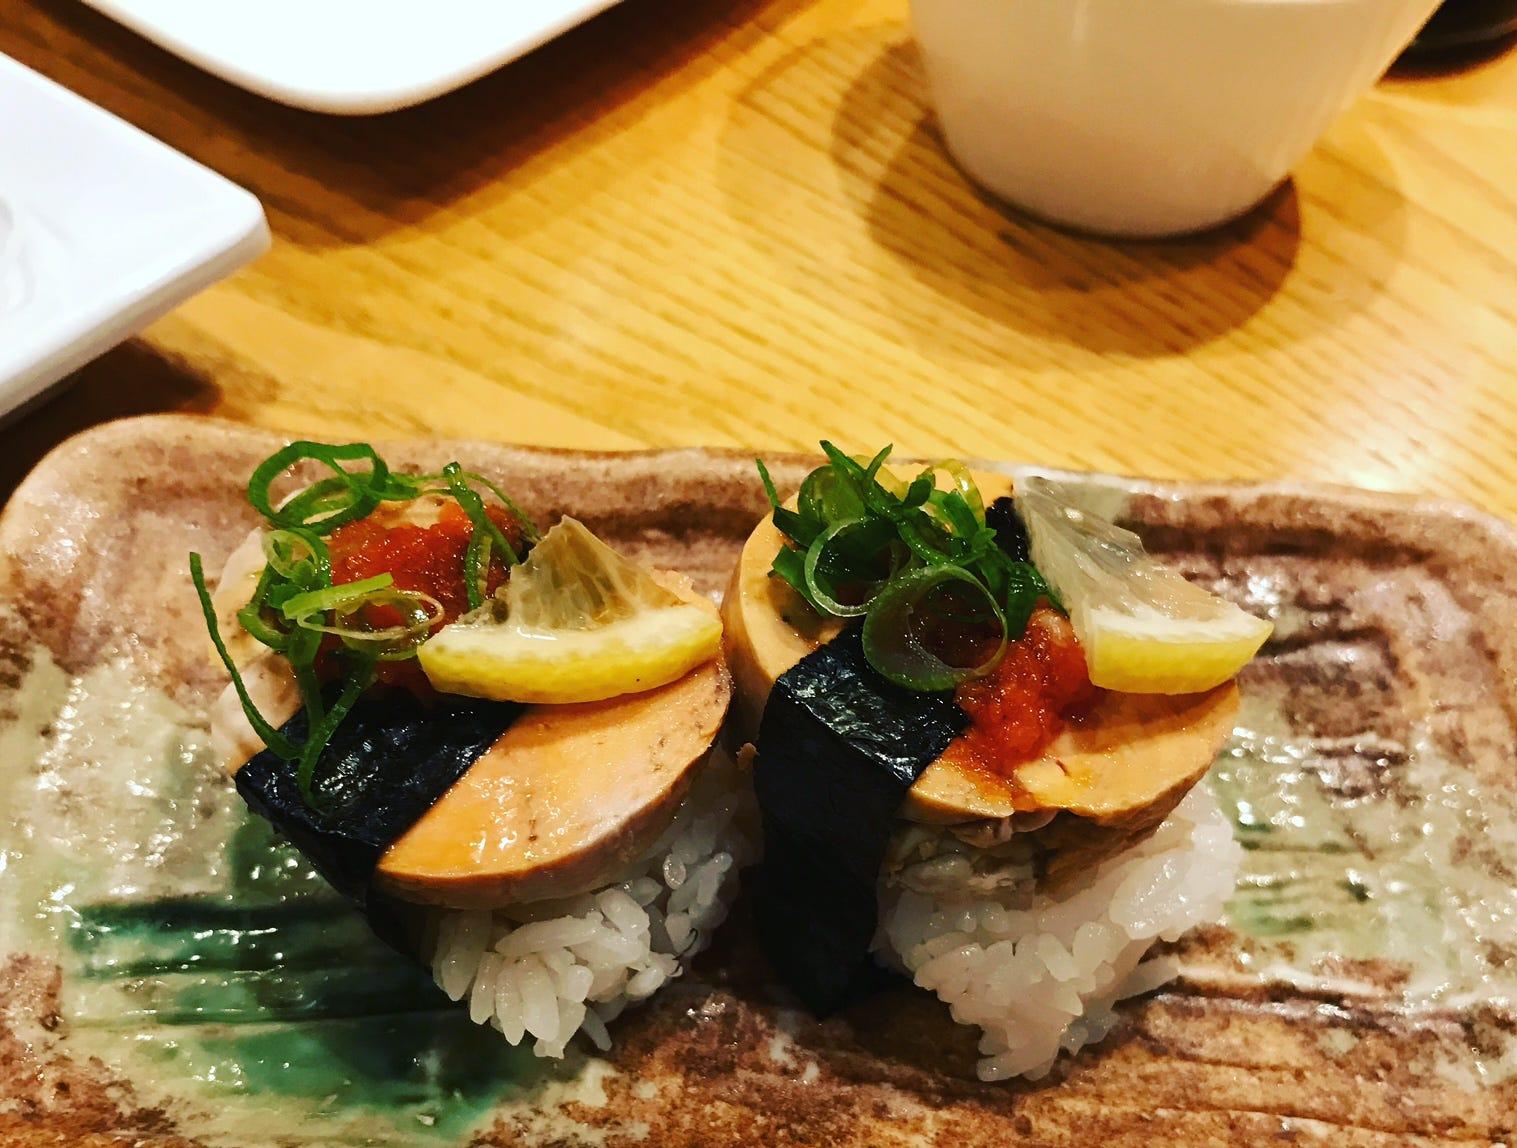 BurgerHaus, Sakura Bana, Tofu House: Best dishes we ate in November